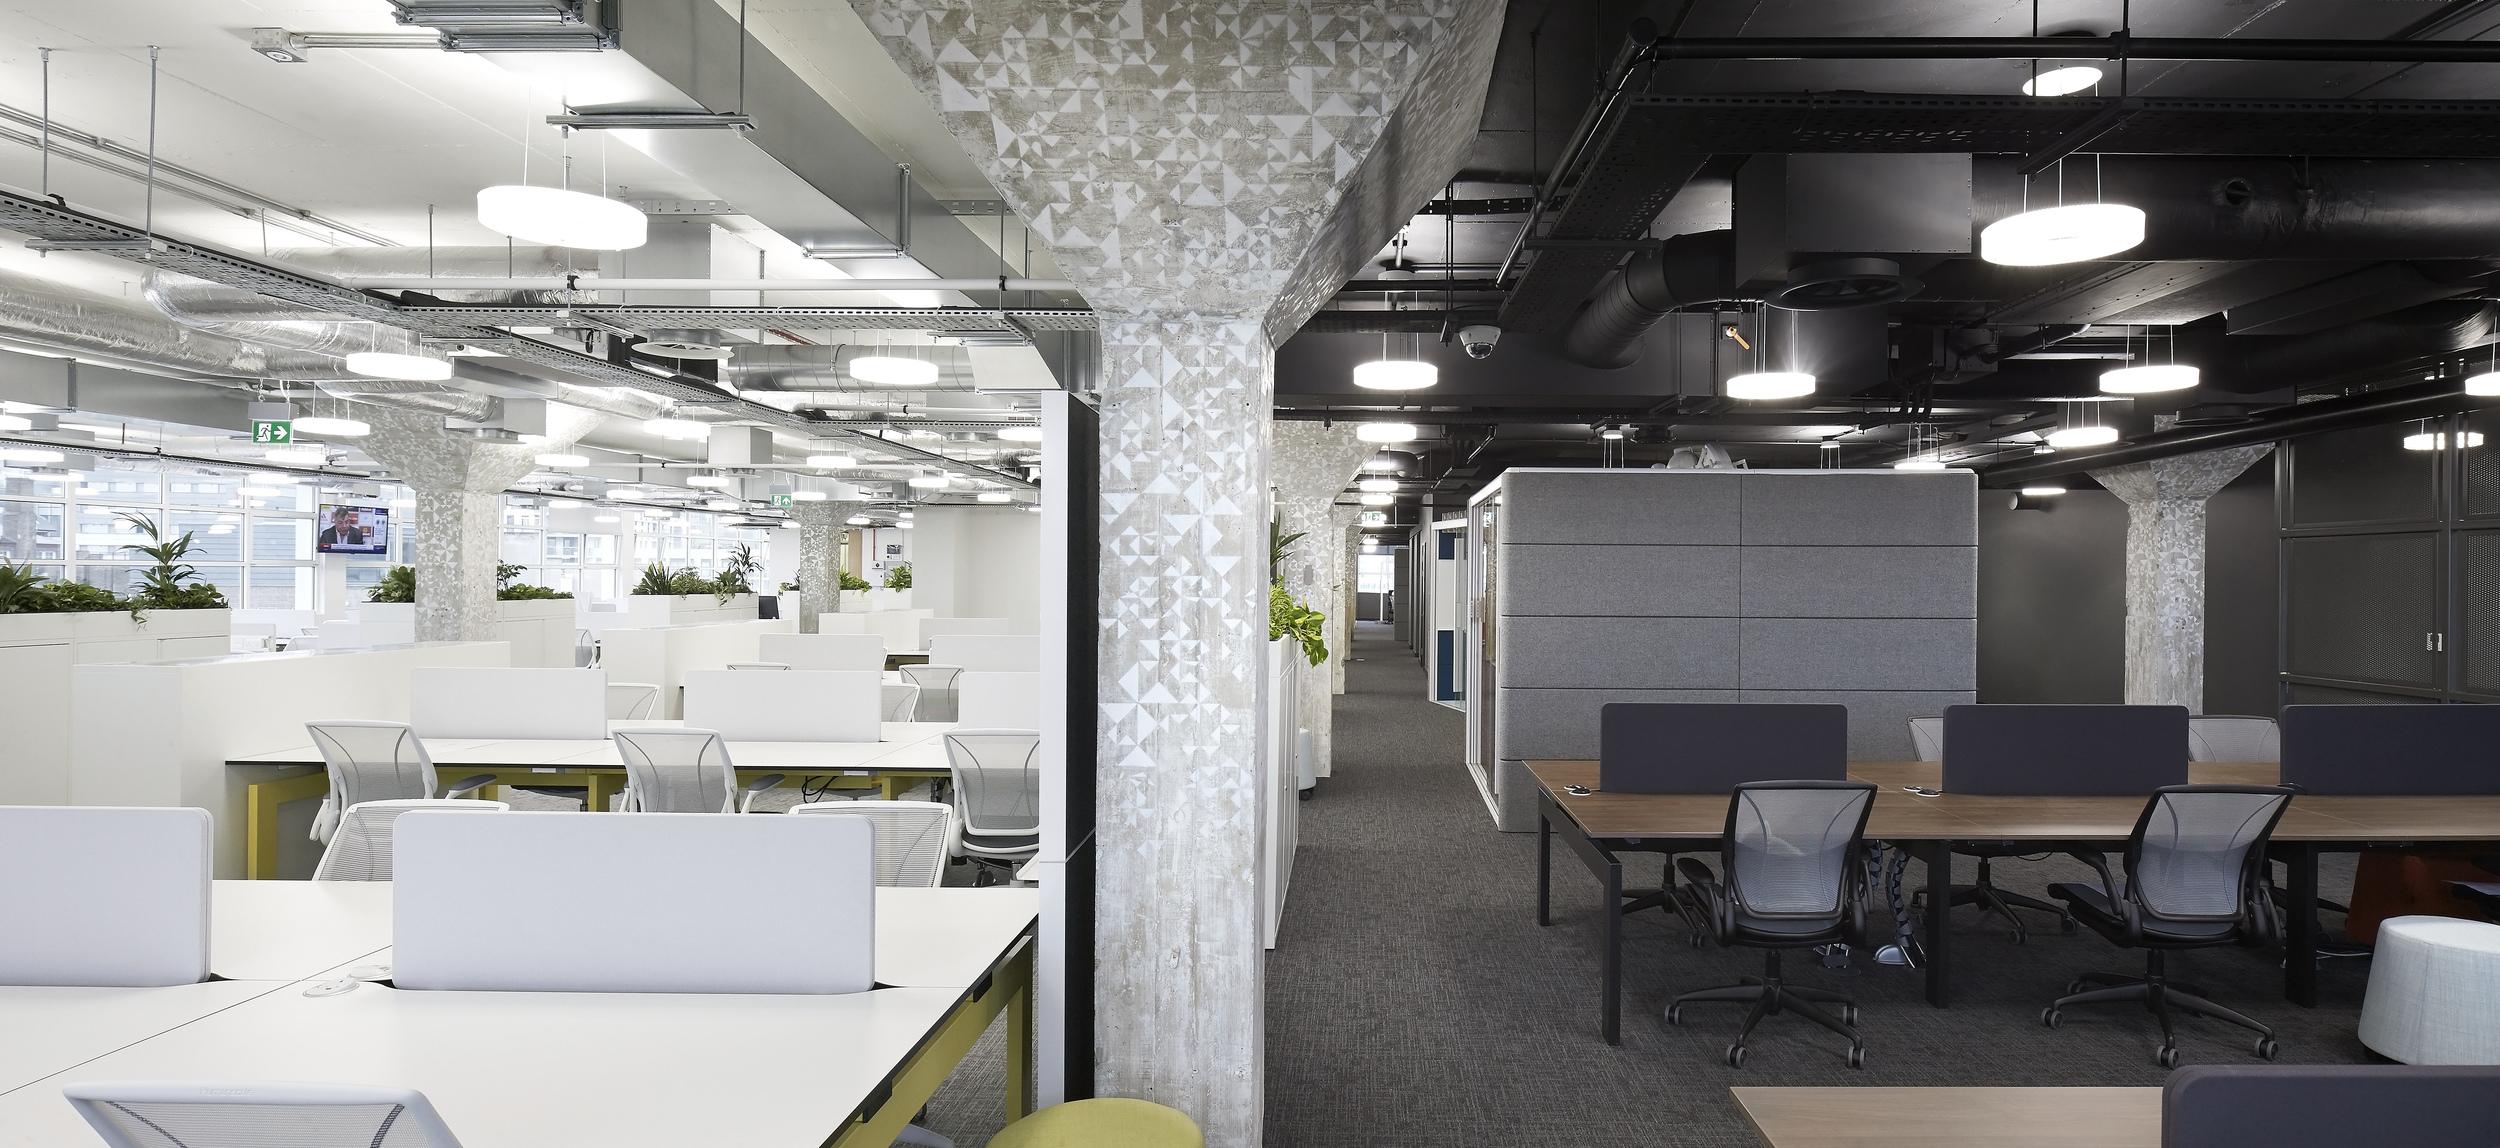 HLW_SKY offices_Brick Lane_-®Hufton+Crow_006.jpg